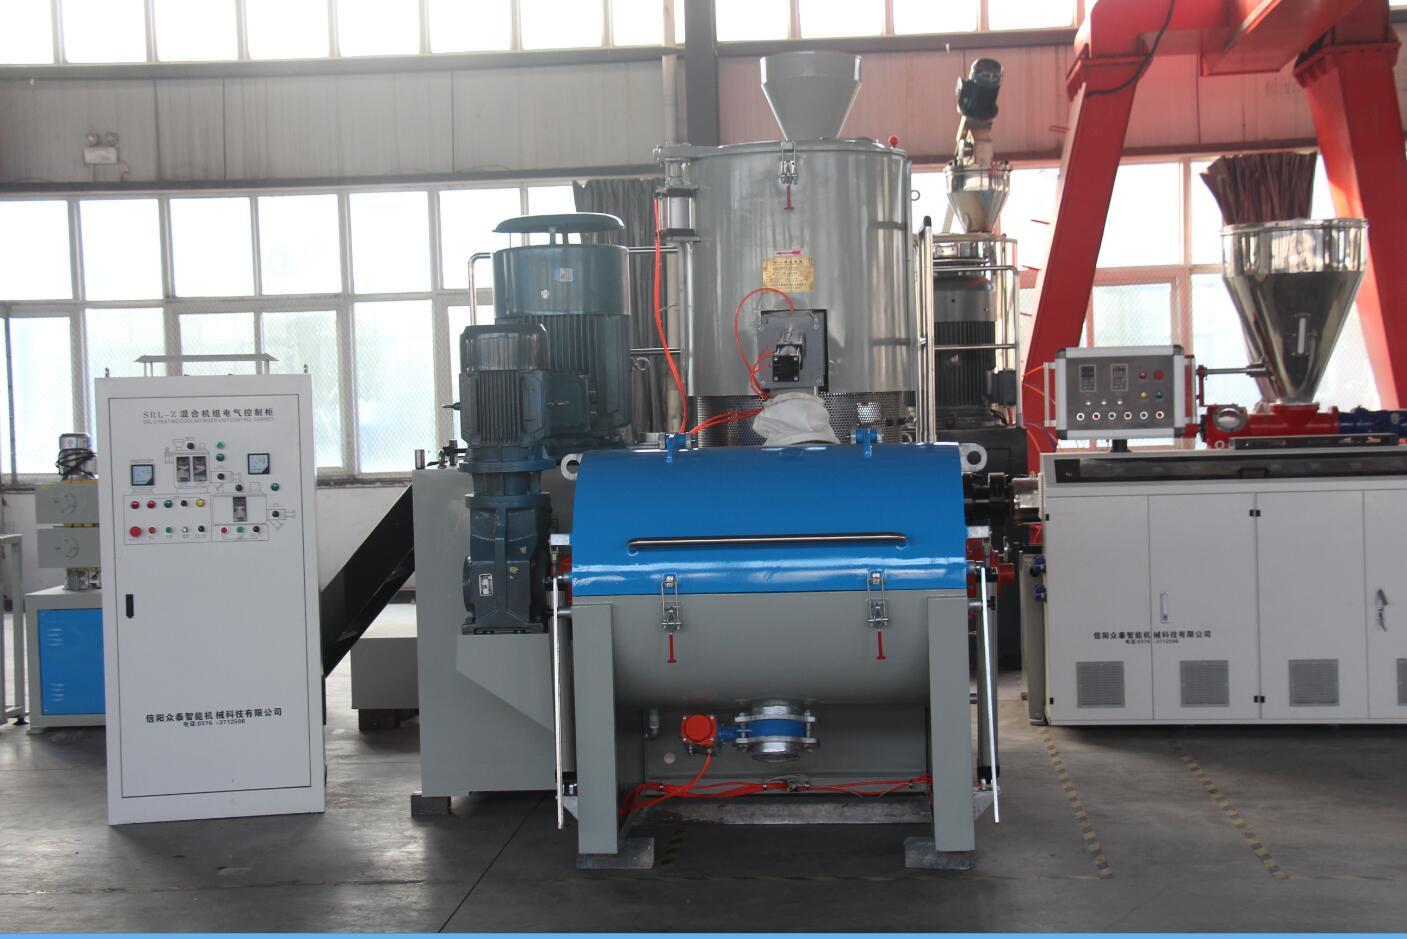 Plastic Mixer Machine - XINYANG ZHONGTAI INTELLIGENT MECHANICAL TECHNOLOGY CO., LTD.